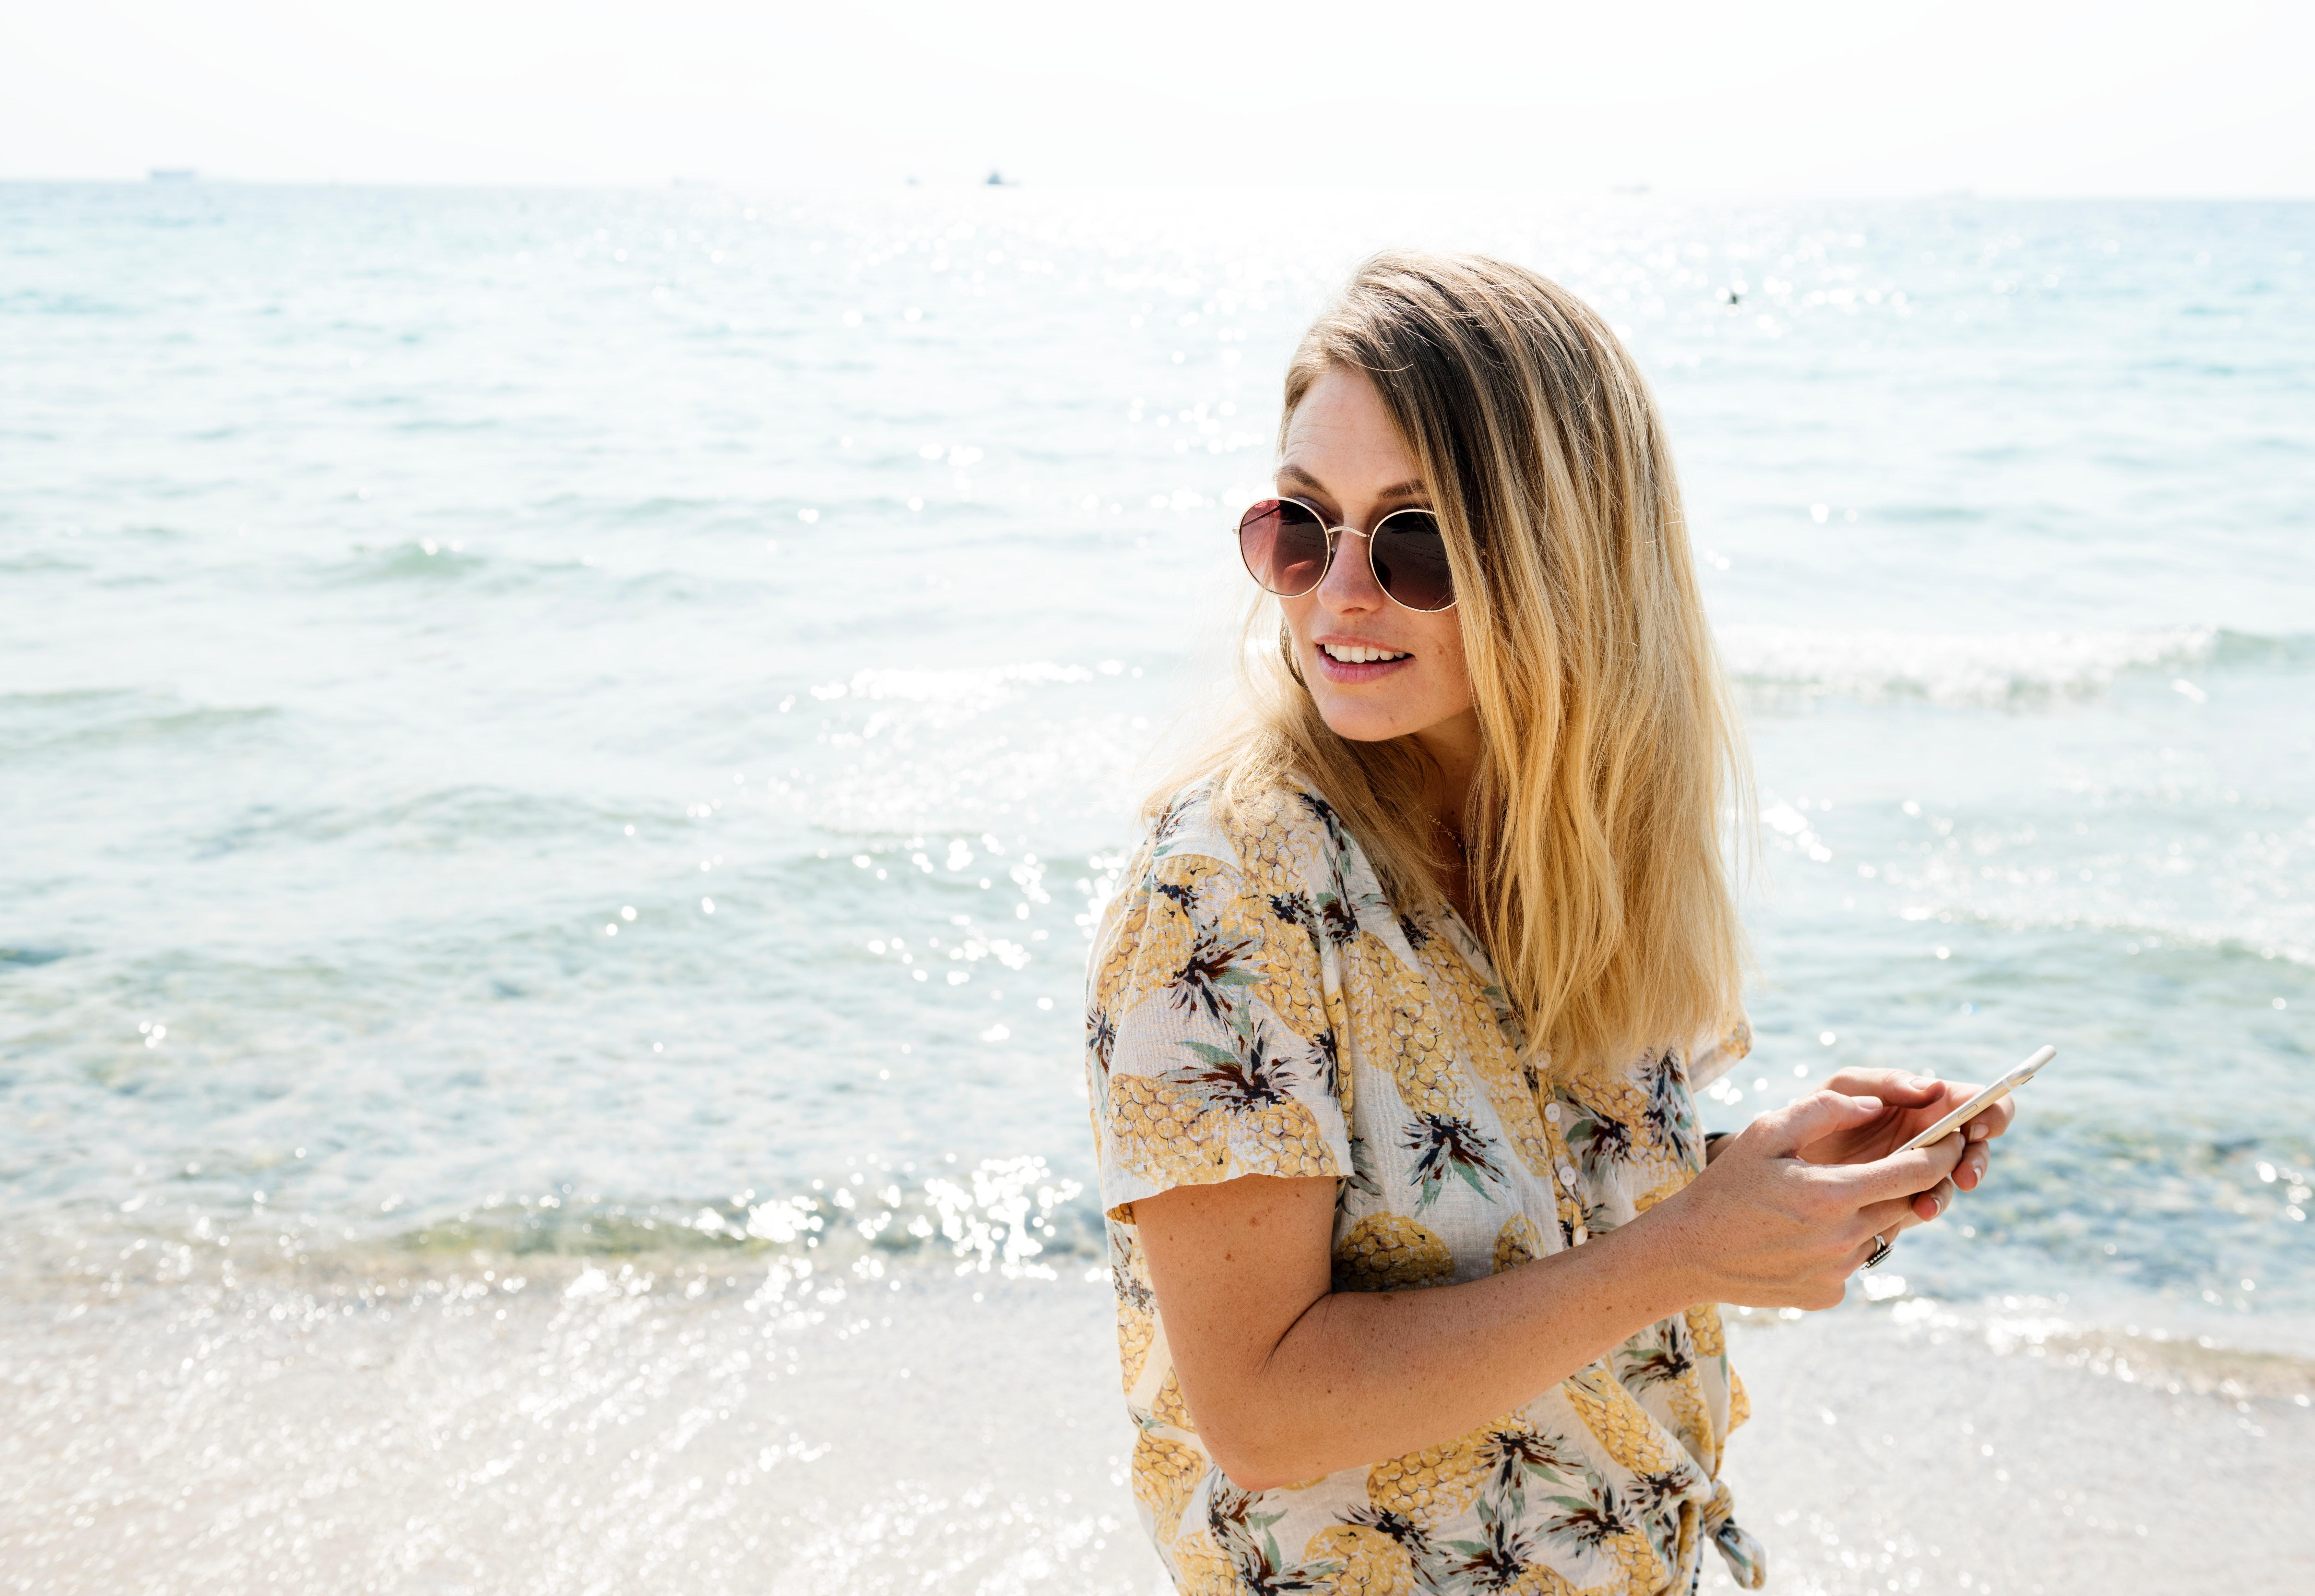 adventure-beach-beautiful-681793